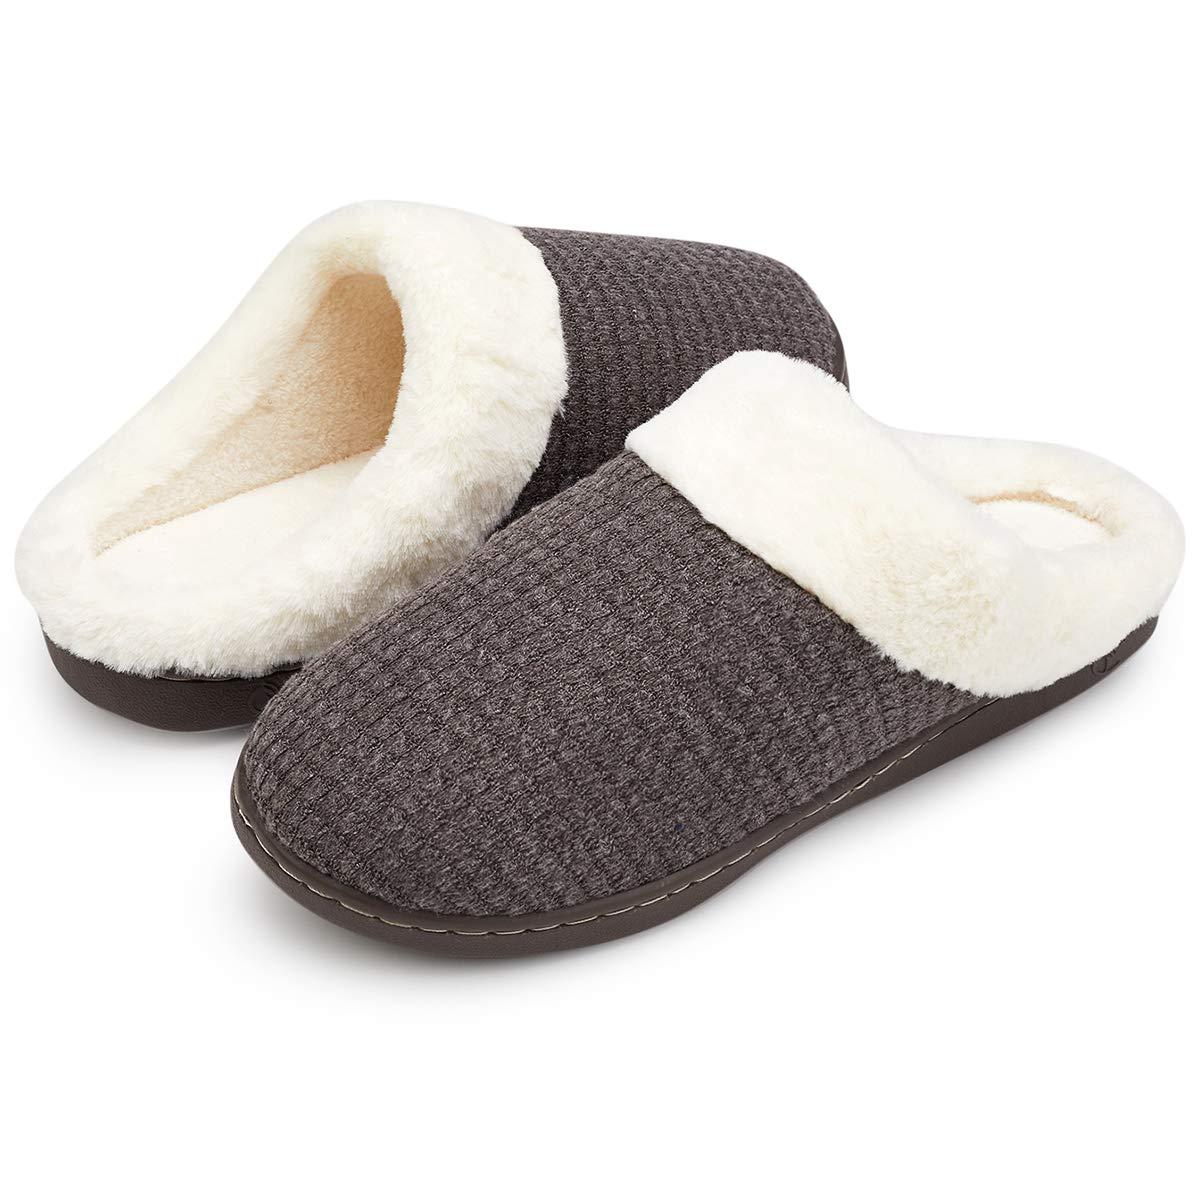 VIFUUR Women's Indoor Slippers House Comfort Memory Foam Plush Anti-Slip Slipper Outdoor Shoes Khaki Gray-42/43